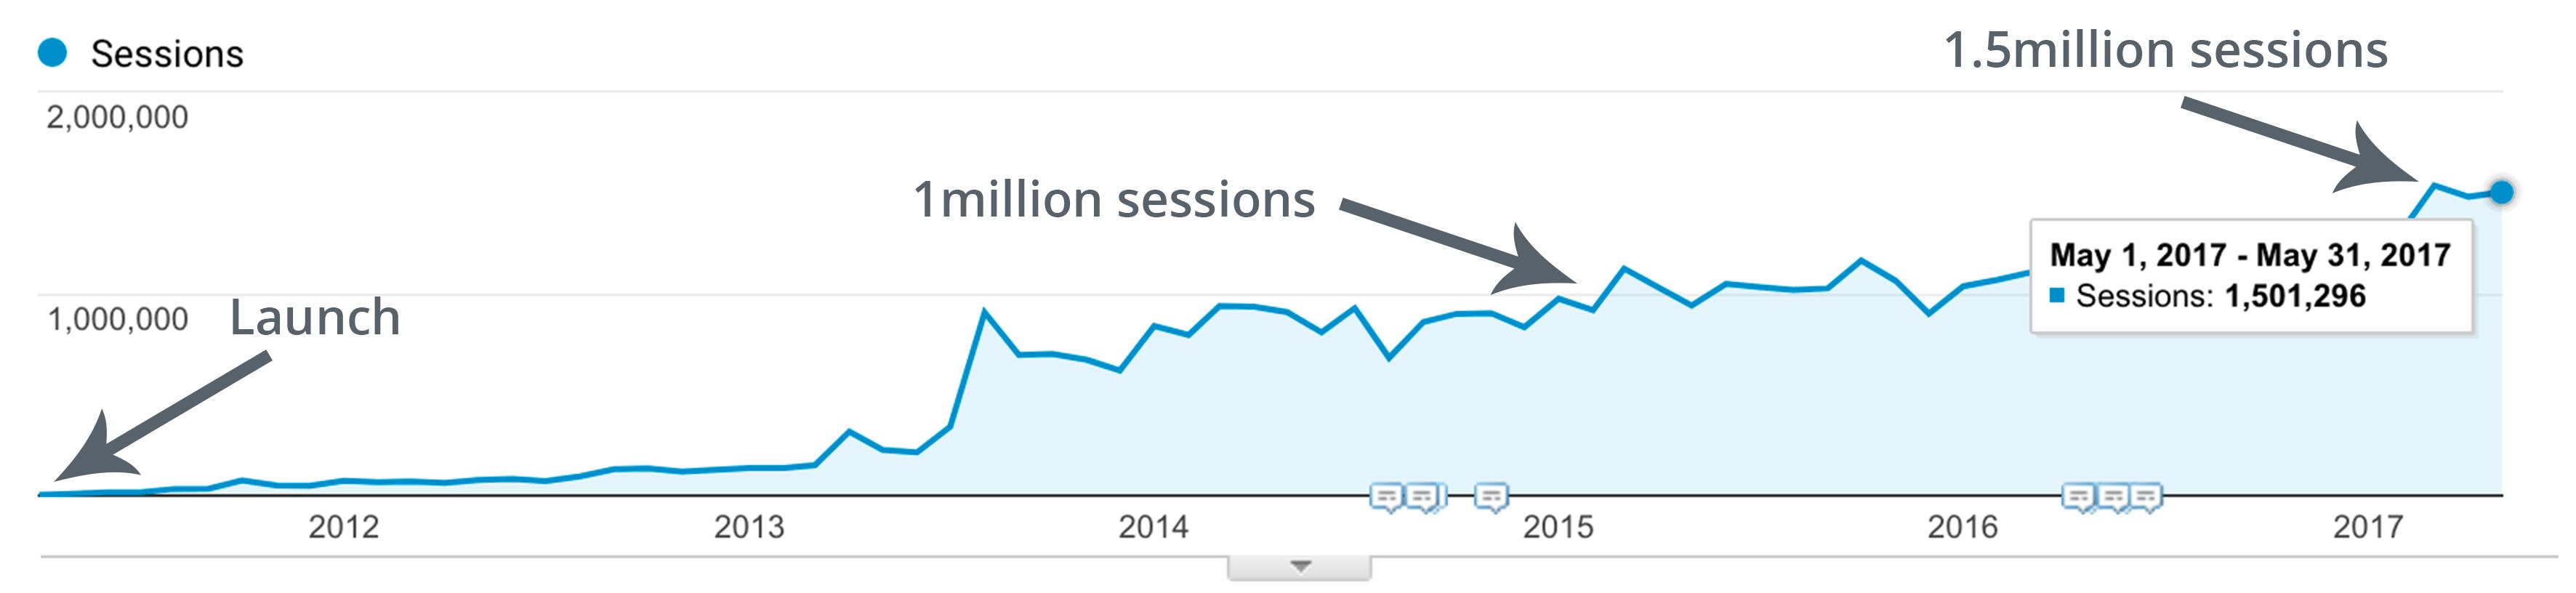 увеличение трафика за 4 года до 1500000 посетителей